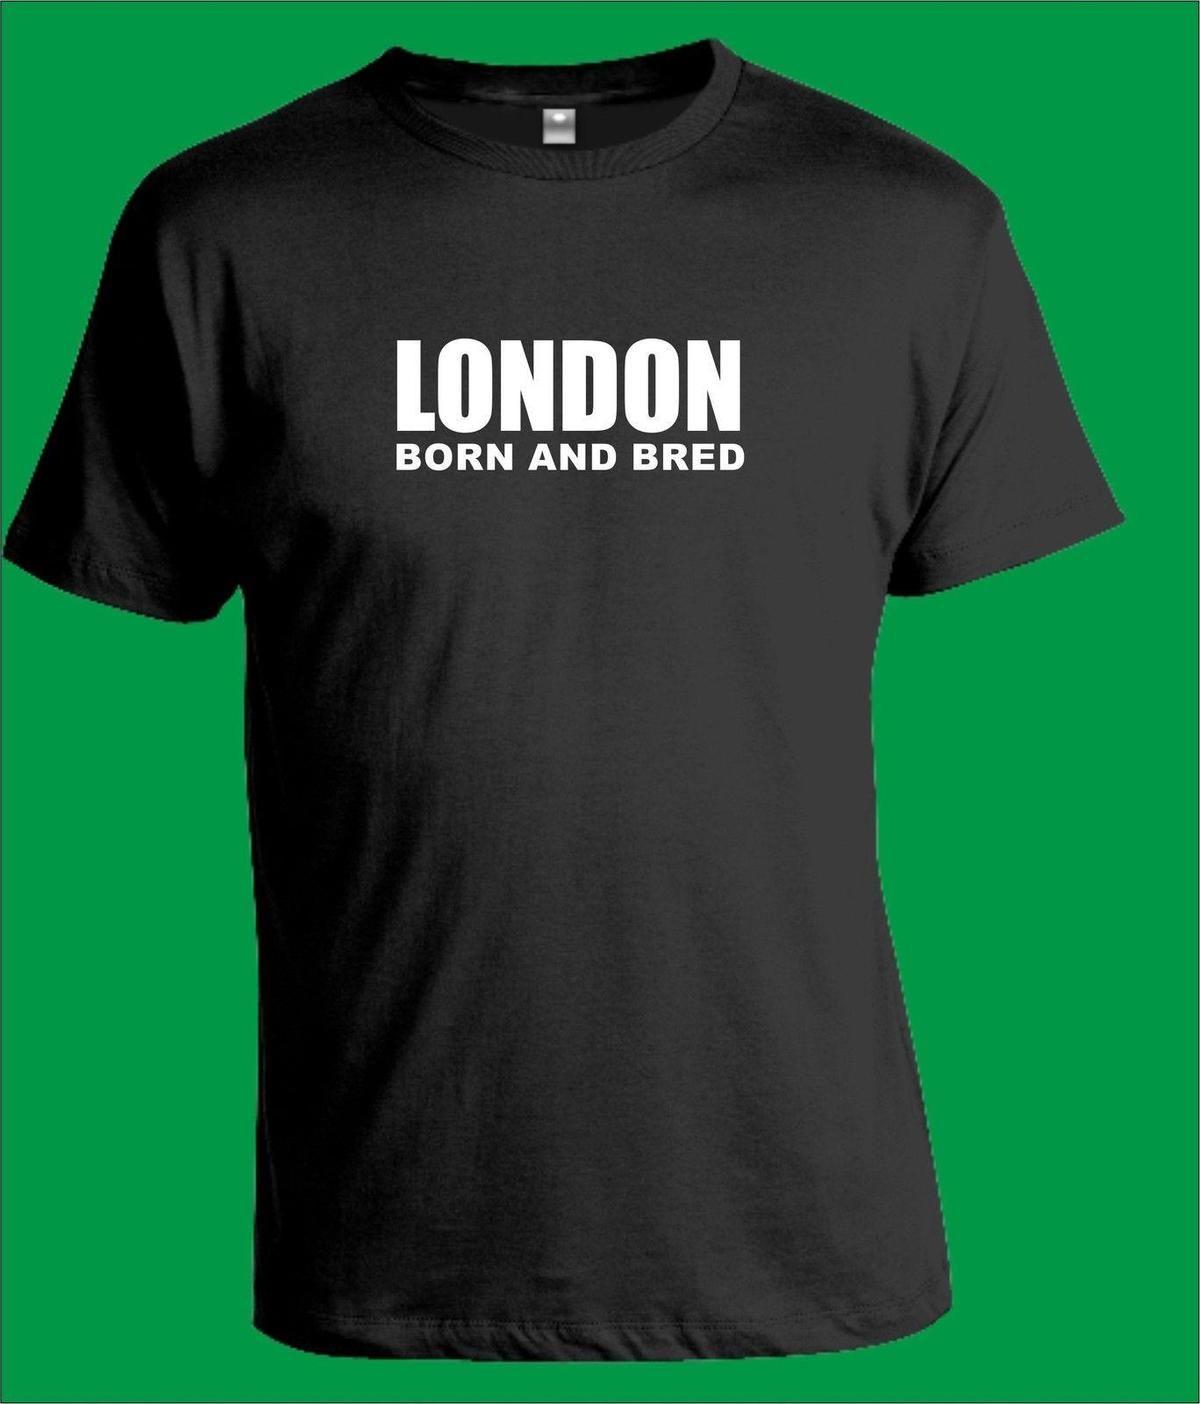 ec89b1eaf LONDON BORN AND BRED T Shirt Slogan Funny Gift Vintage Tee Shirts Family T  Shirts From Yuxin01, $13.8| DHgate.Com